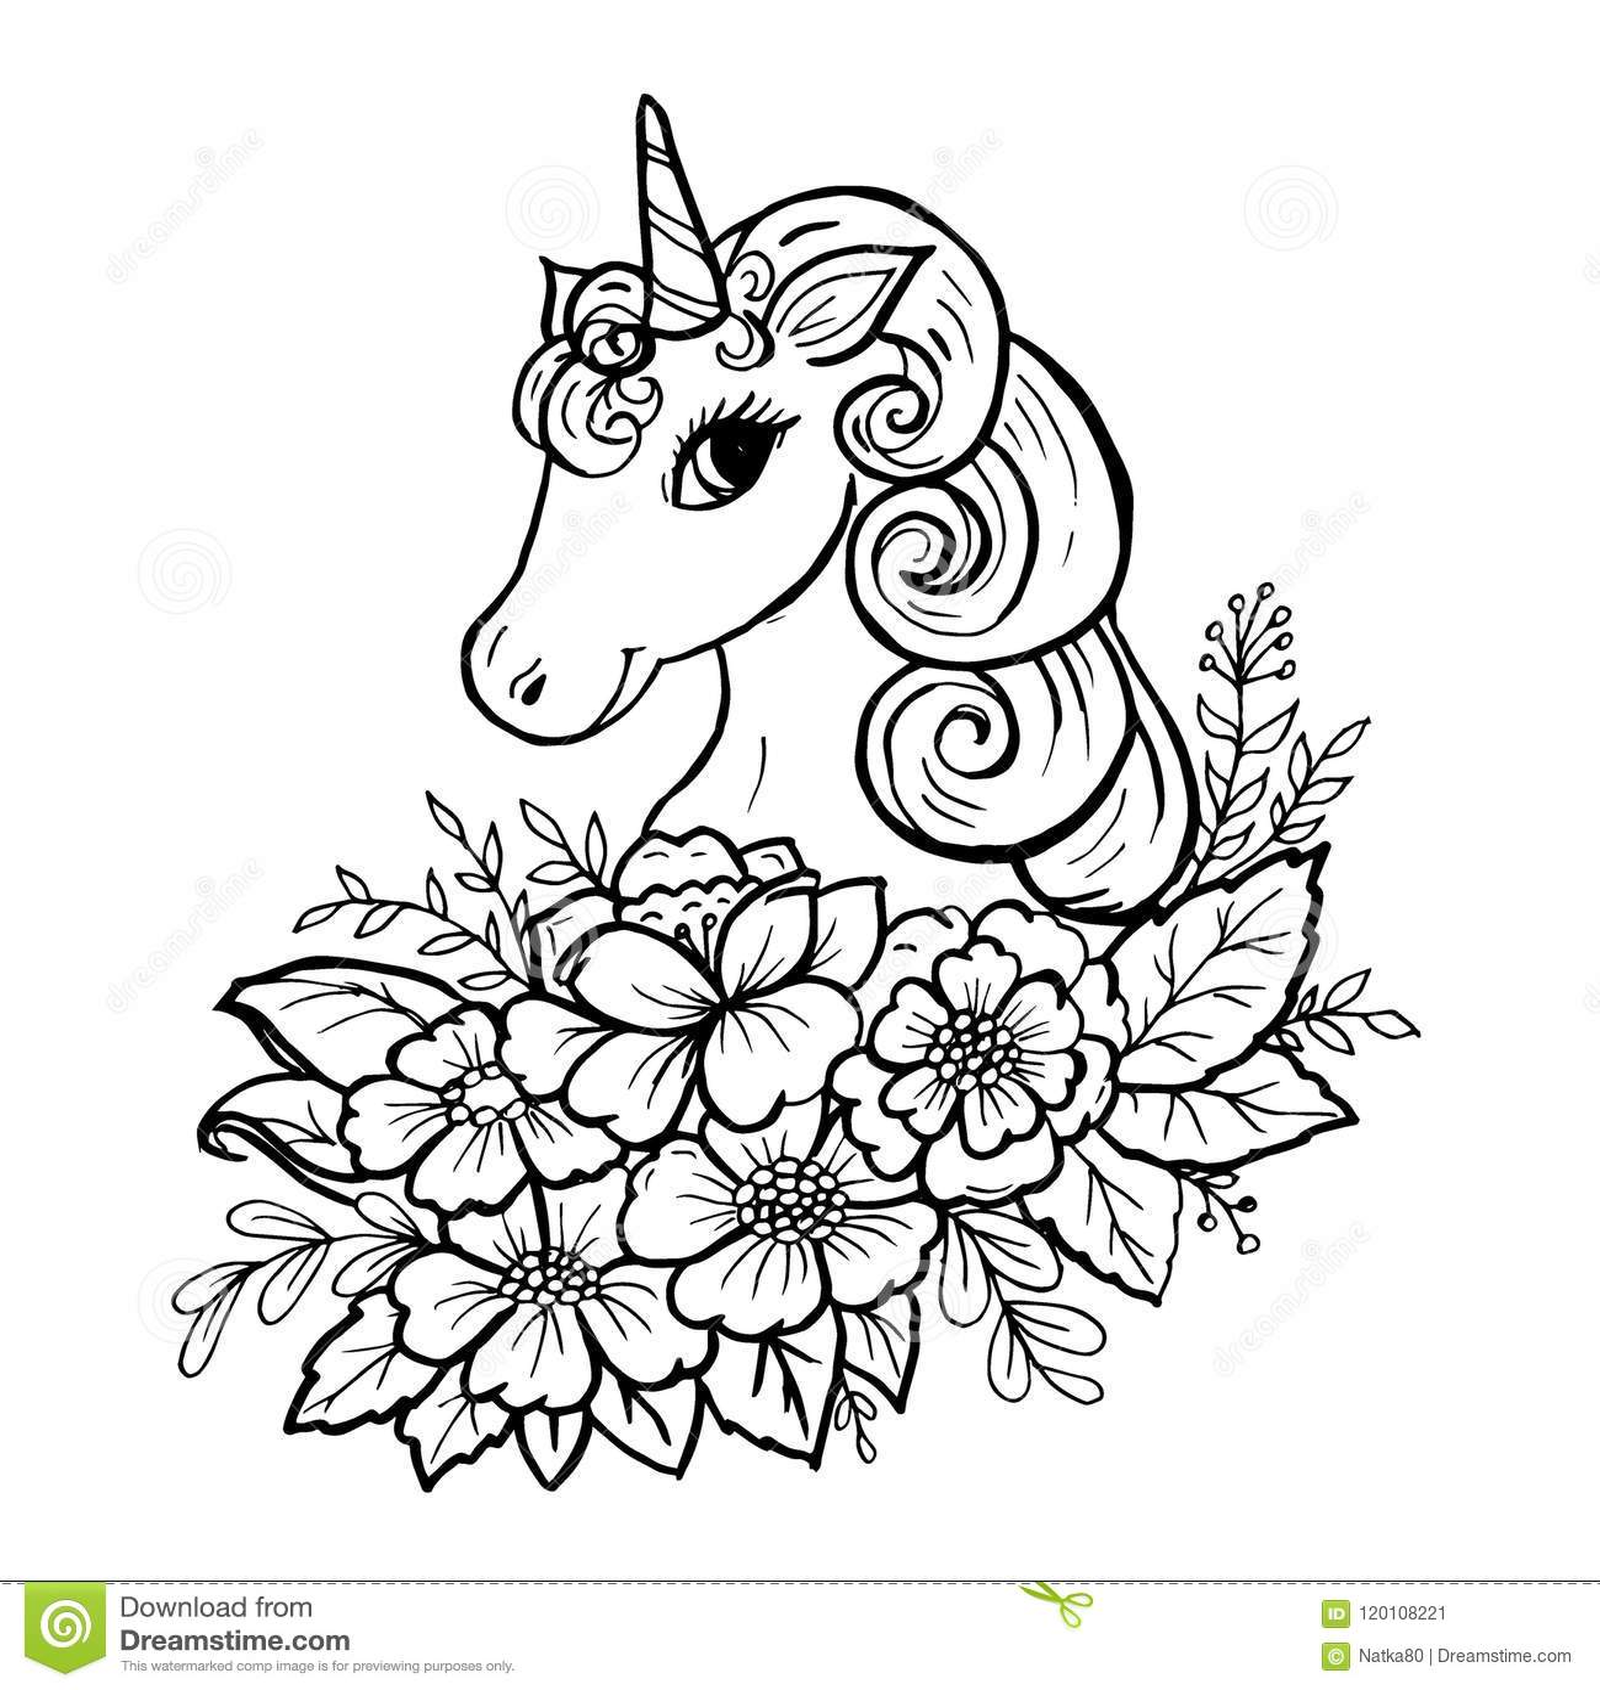 Doodle Cute Unicorn Head Stock Vector Illustration Of